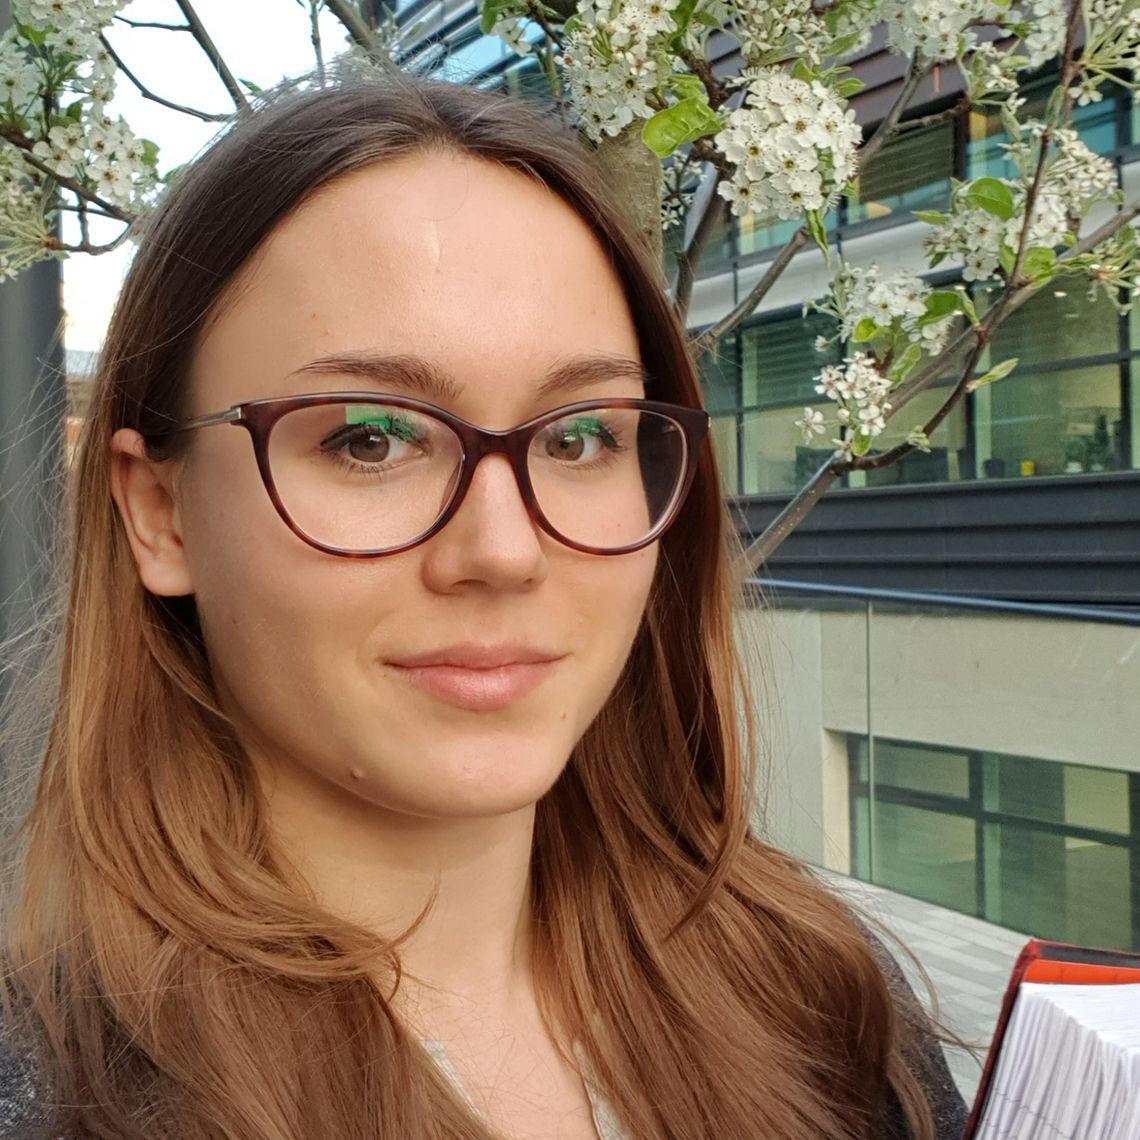 Maria Prange-Barczynska